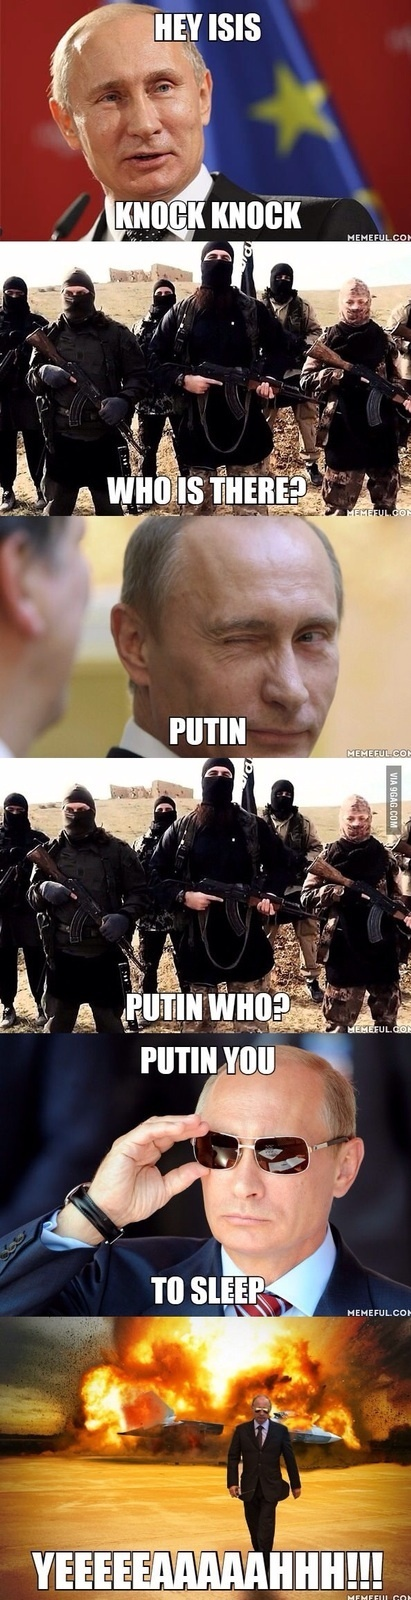 Putin badass das kebrada - meme